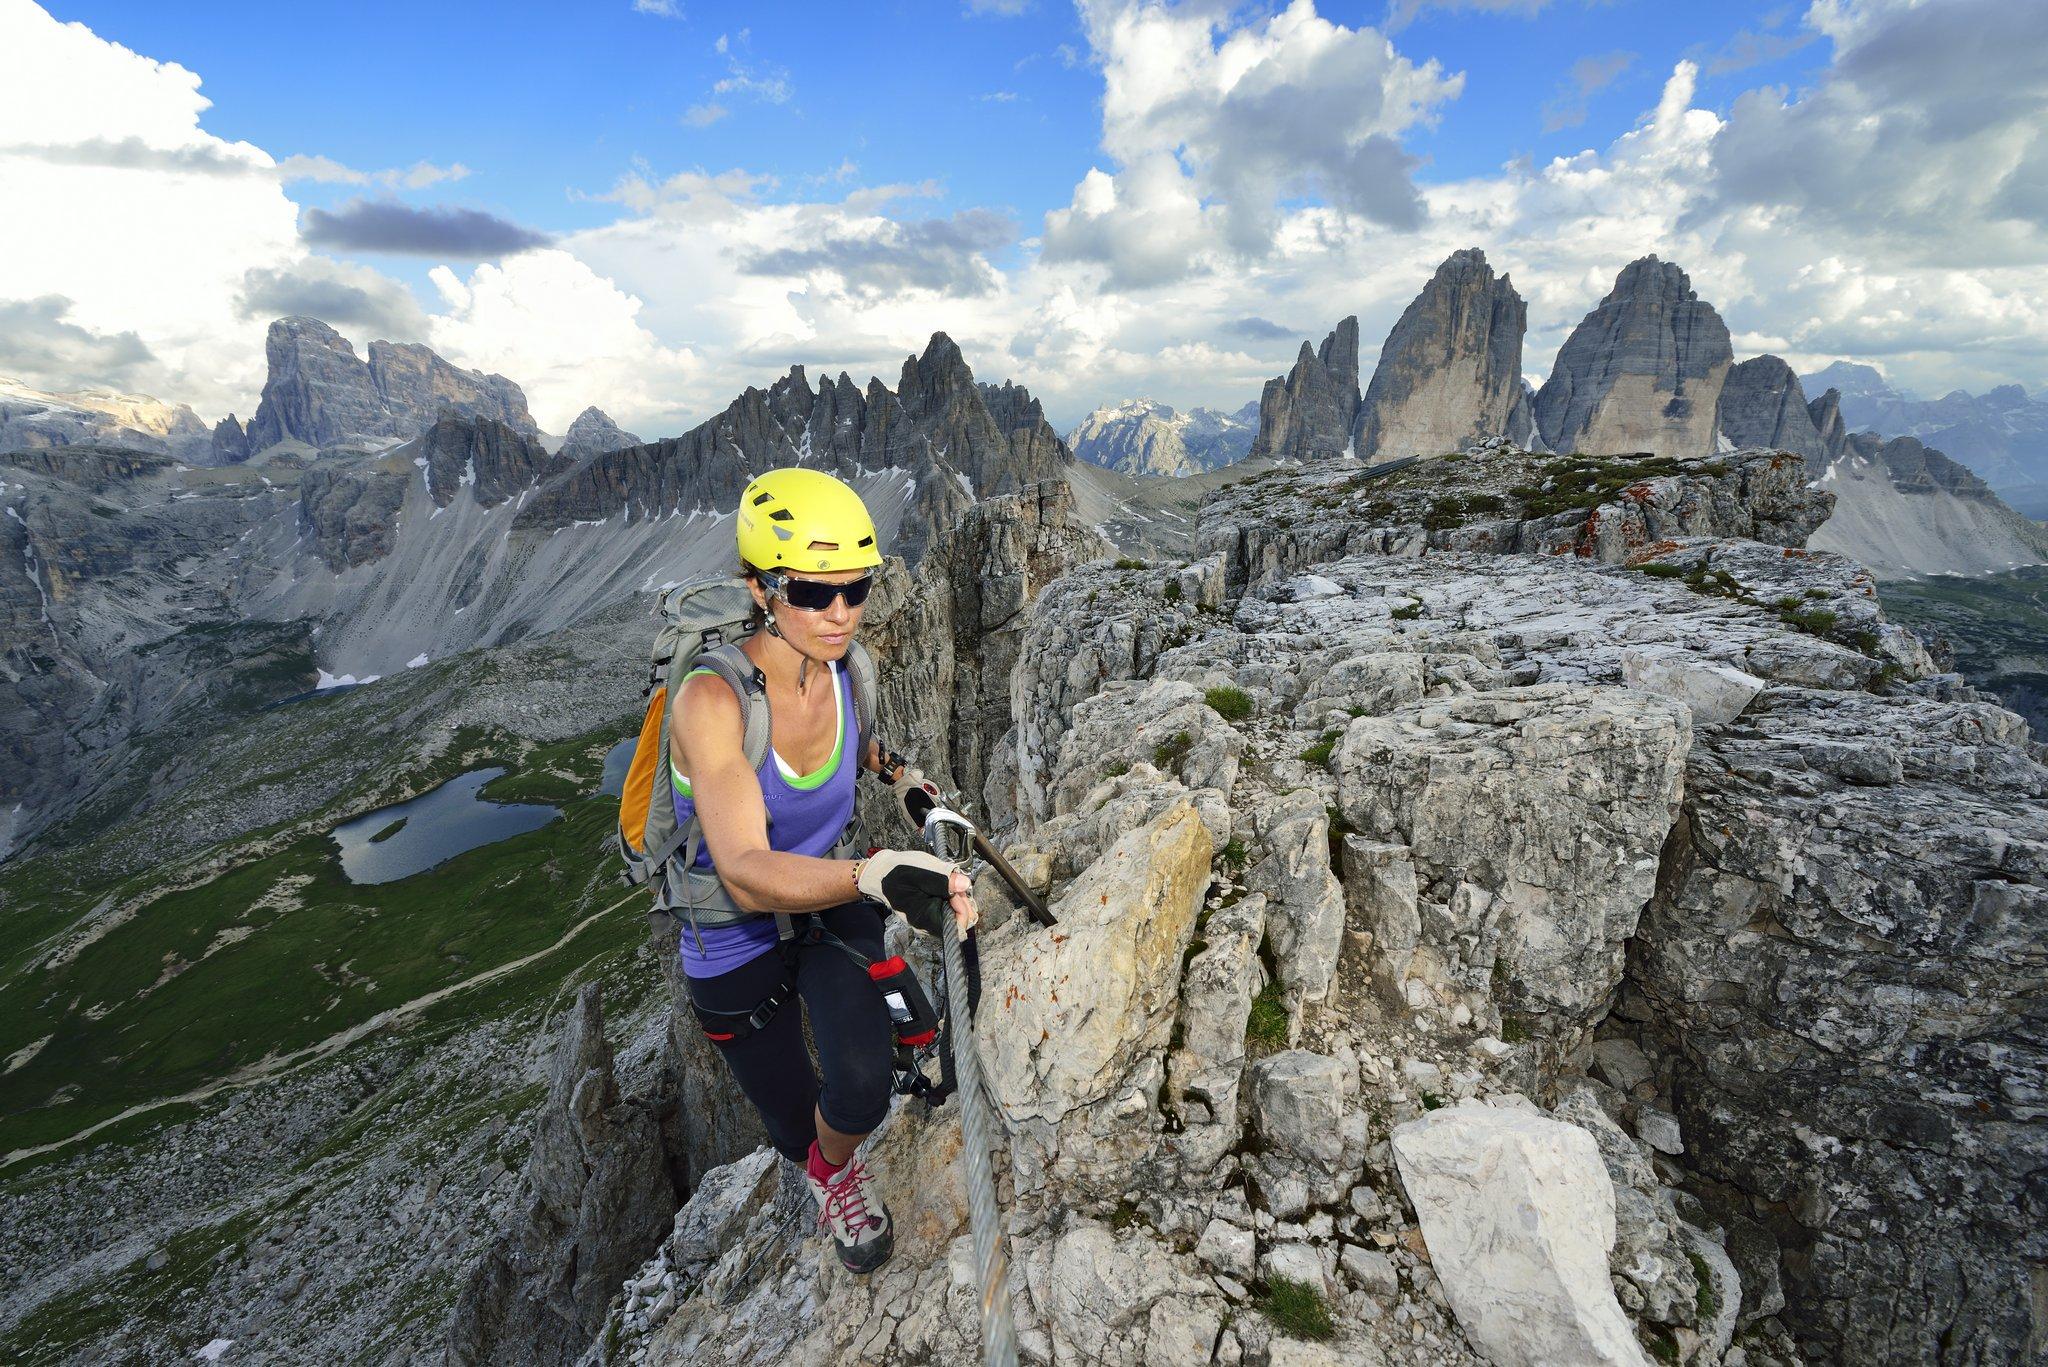 Klettersteig Drei Zinnen : Klettersteige dolomiten u sexten drei zinnen i südtirol